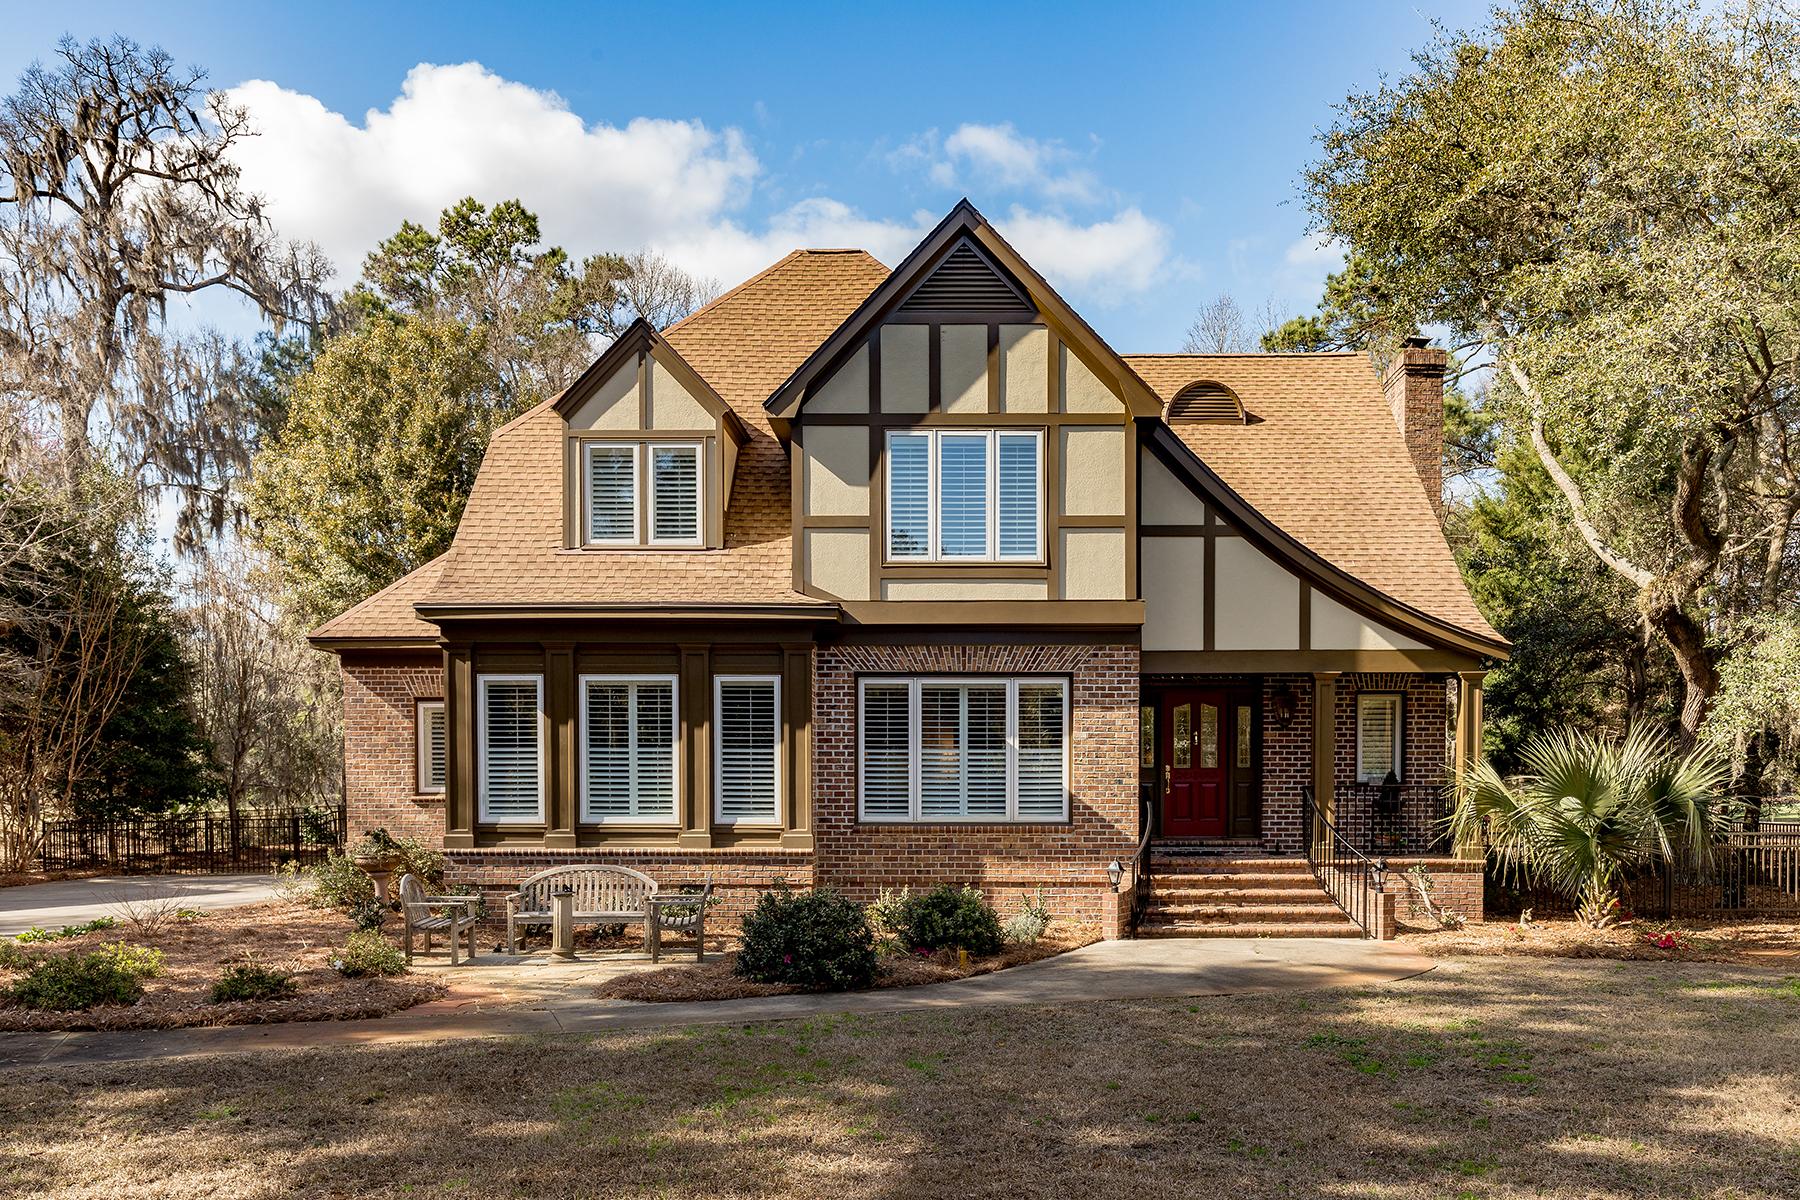 Villa per Vendita alle ore 123 Pinckney Rd Georgetown, Carolina Del Sud, 29440 Stati Uniti